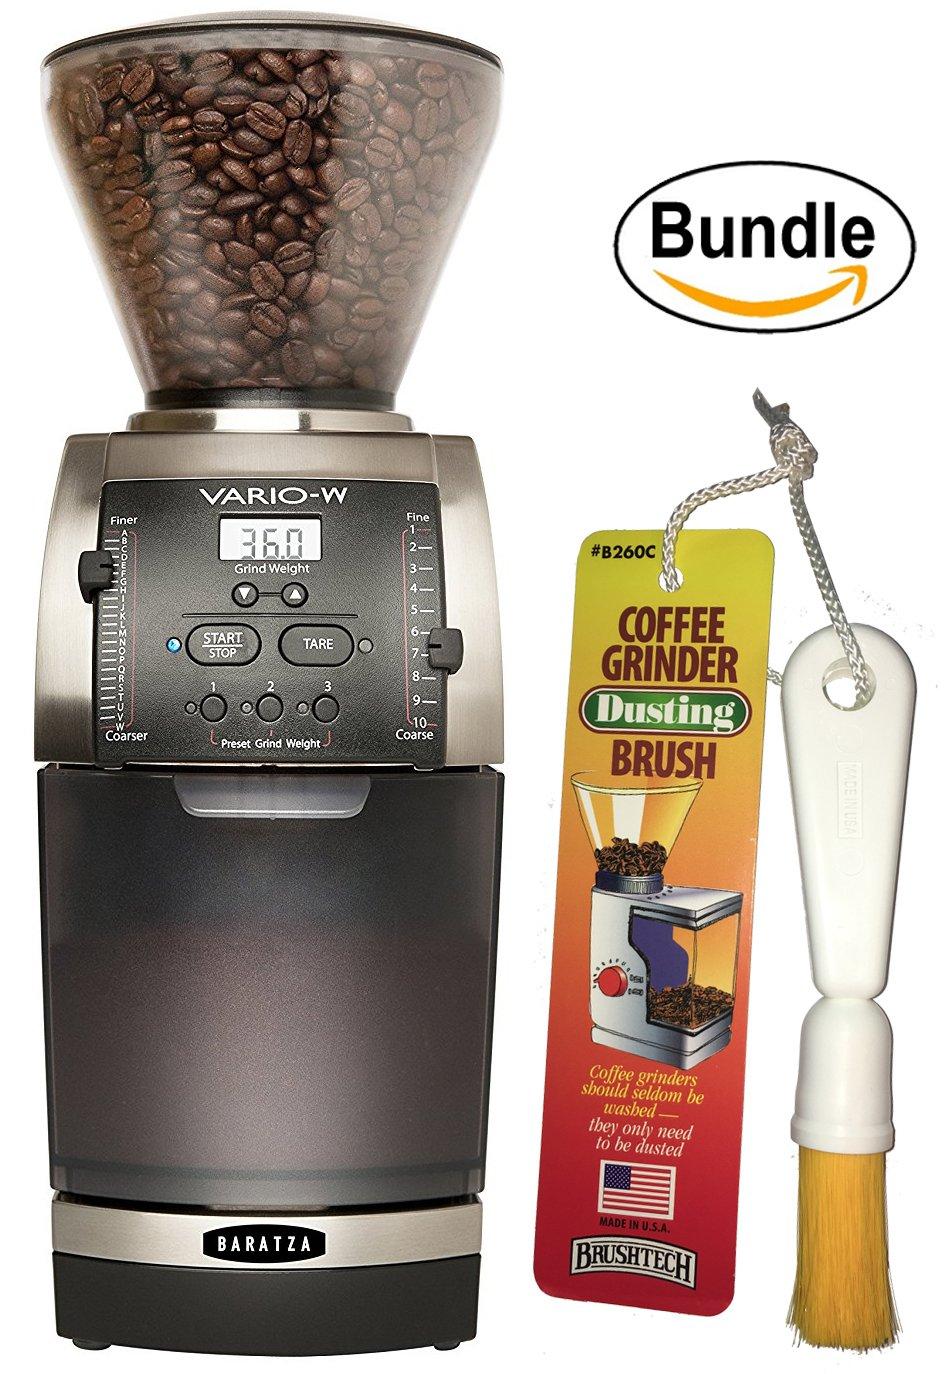 Baratza Vario-W 986 - Flat Ceramic Burr Coffee Grinder (with Shut-off Hopper and Bin) & Brushtech Coffee Grinder Dusting Brush (Bundle)